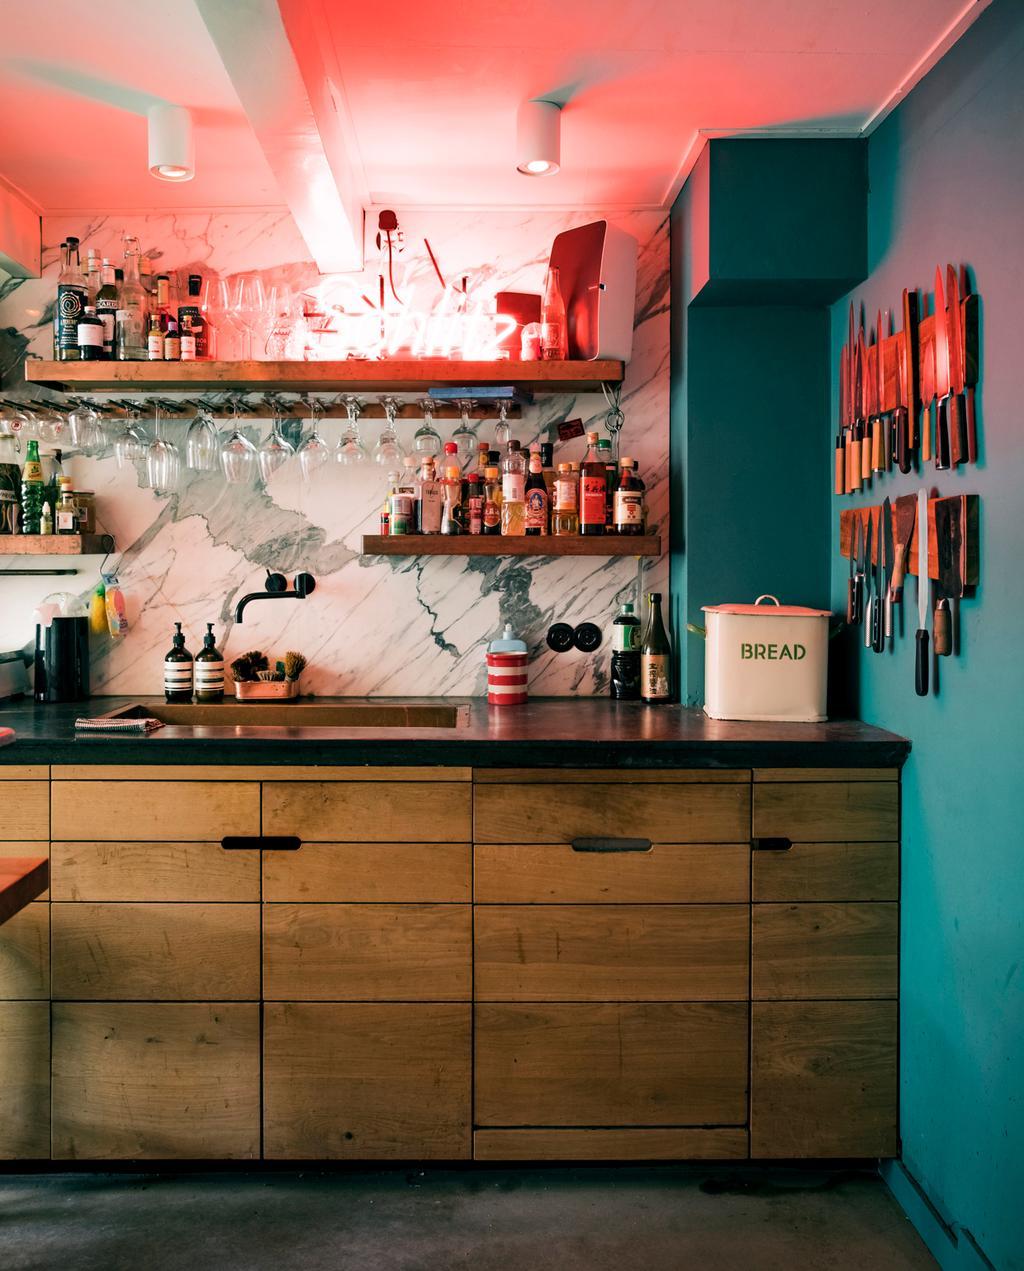 vtwonen 5-2019 | Ambacht Yvette culinair imperium